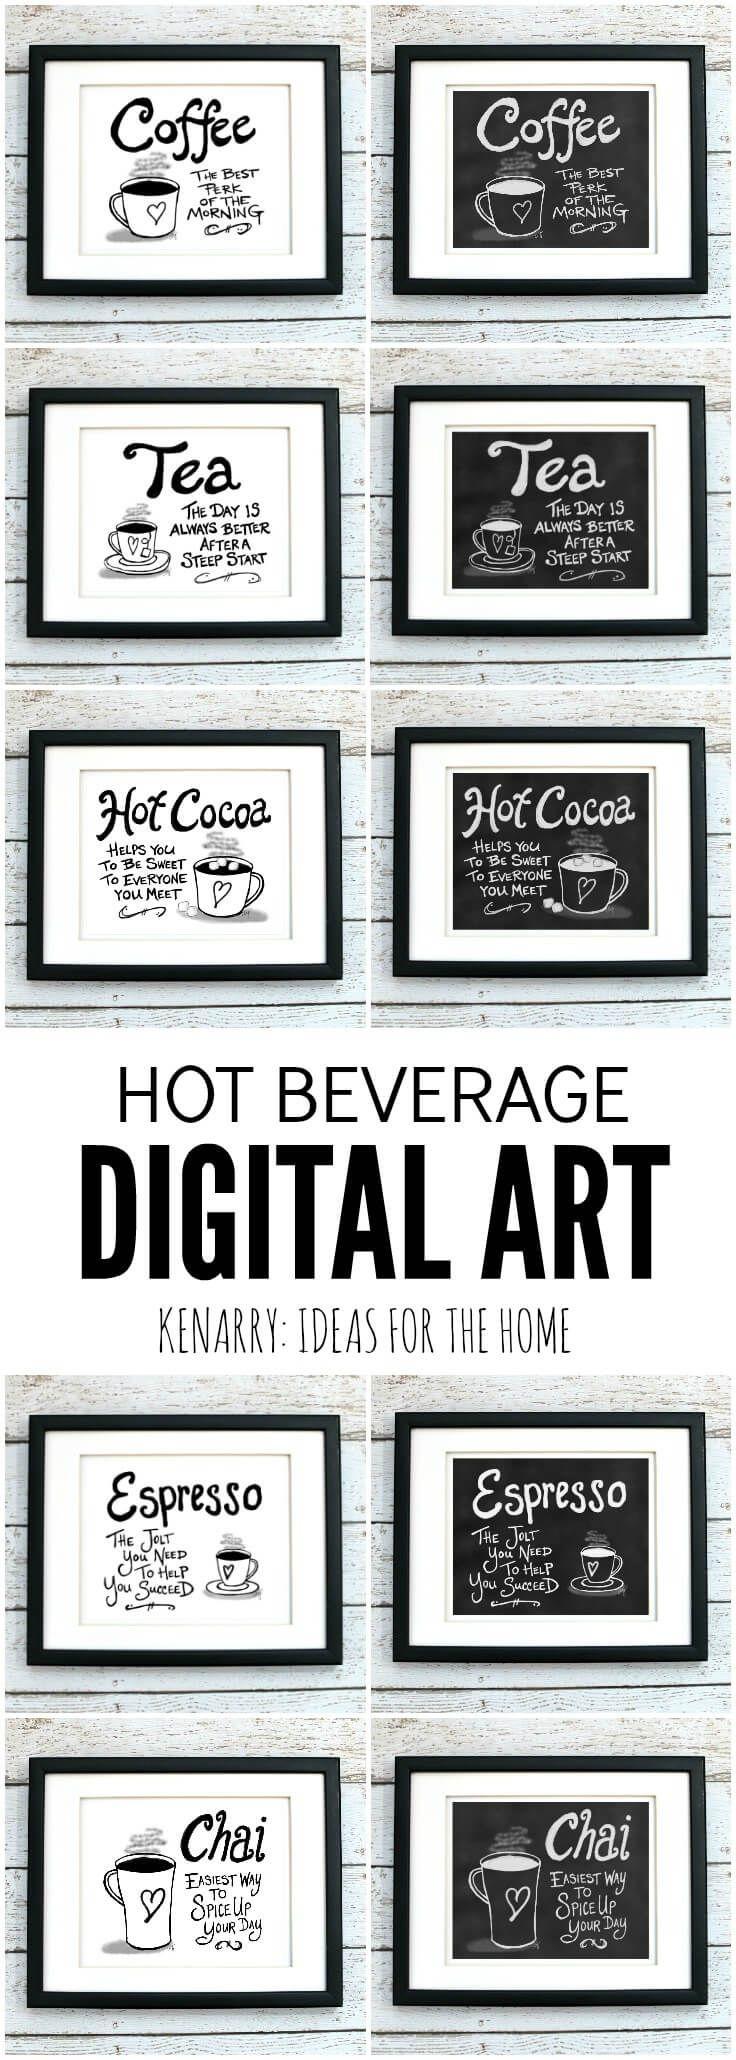 Coffee Wall Art: 10 Inexpensive Digital Kitchen Prints   Pinterest ...